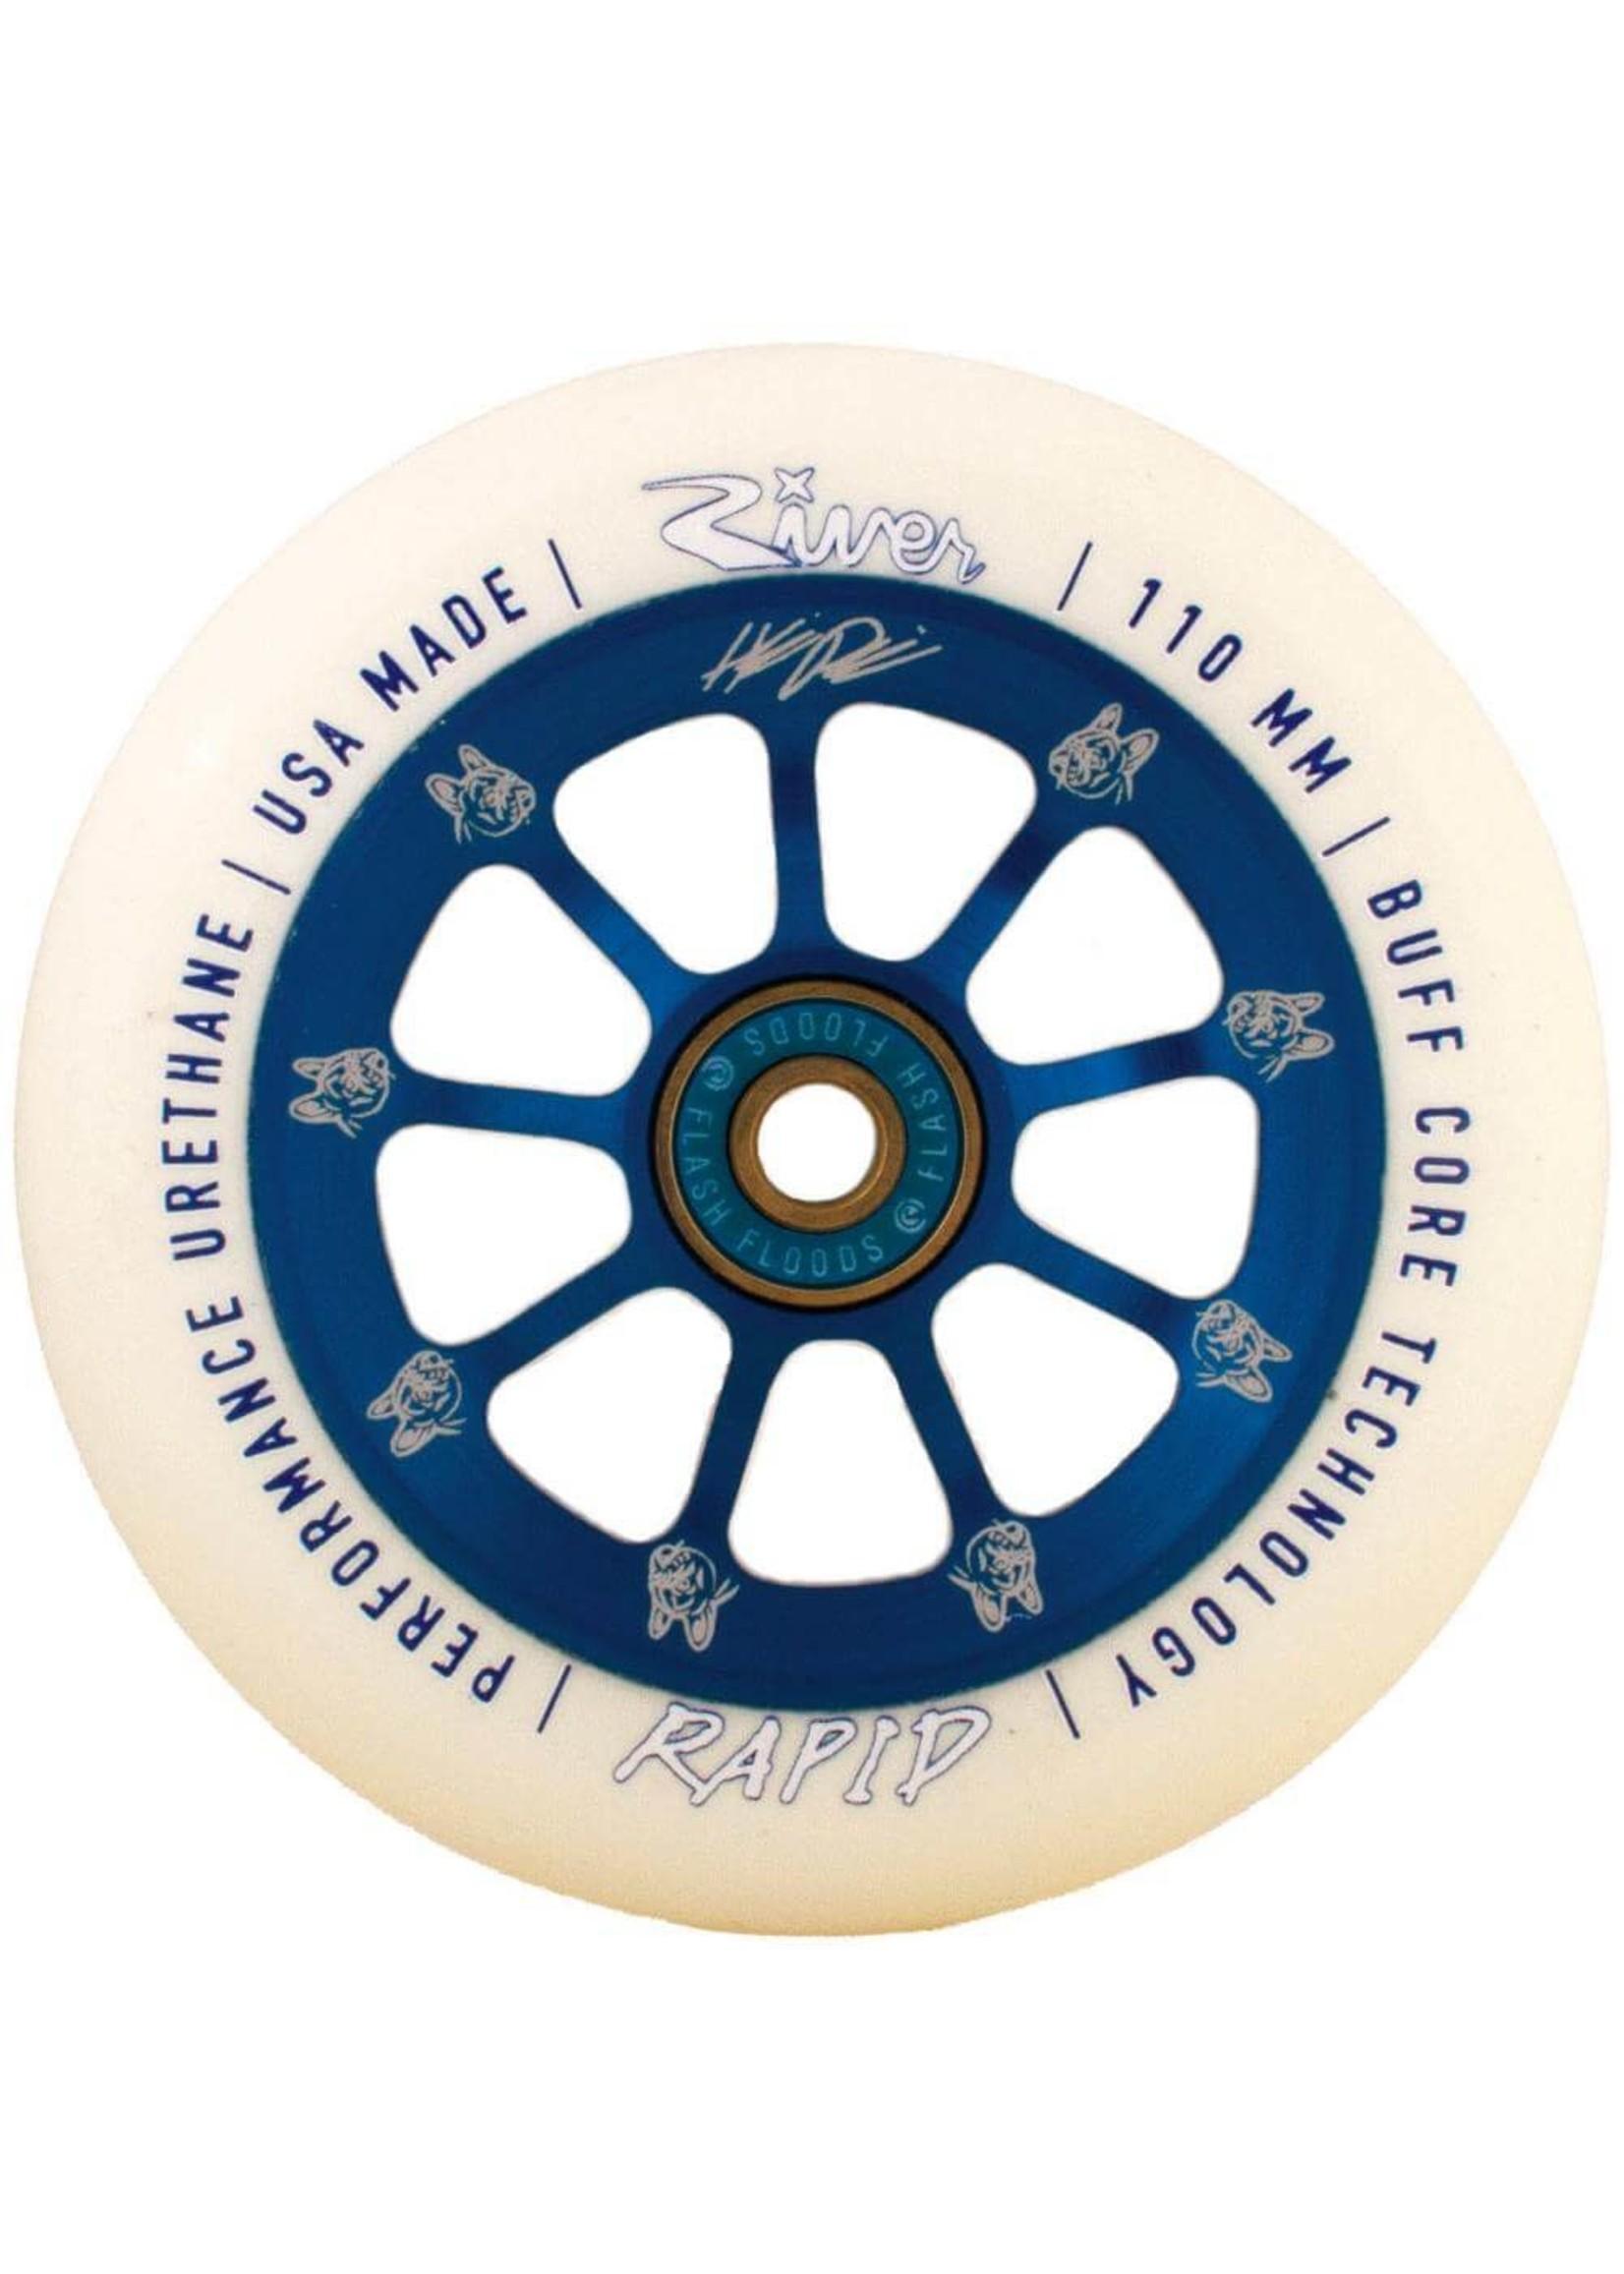 River Wheel Co. River - Glide Wheels Helmeri Pirinen Sig. - 110mm